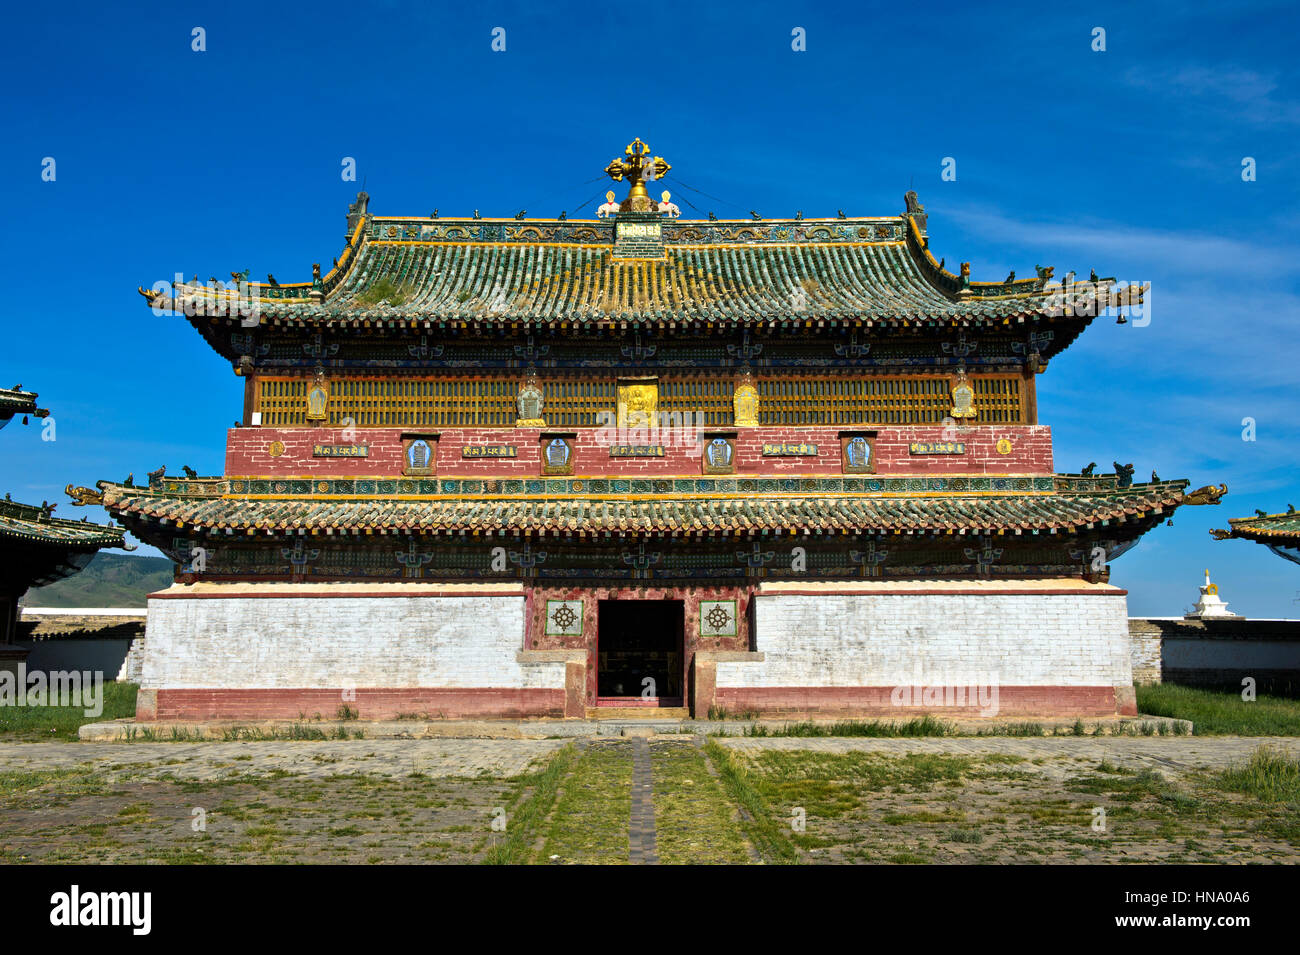 Main temple Erdene Zuu, Kharkhorin, Övörkhangai Aimag, Mongolia - Stock Image